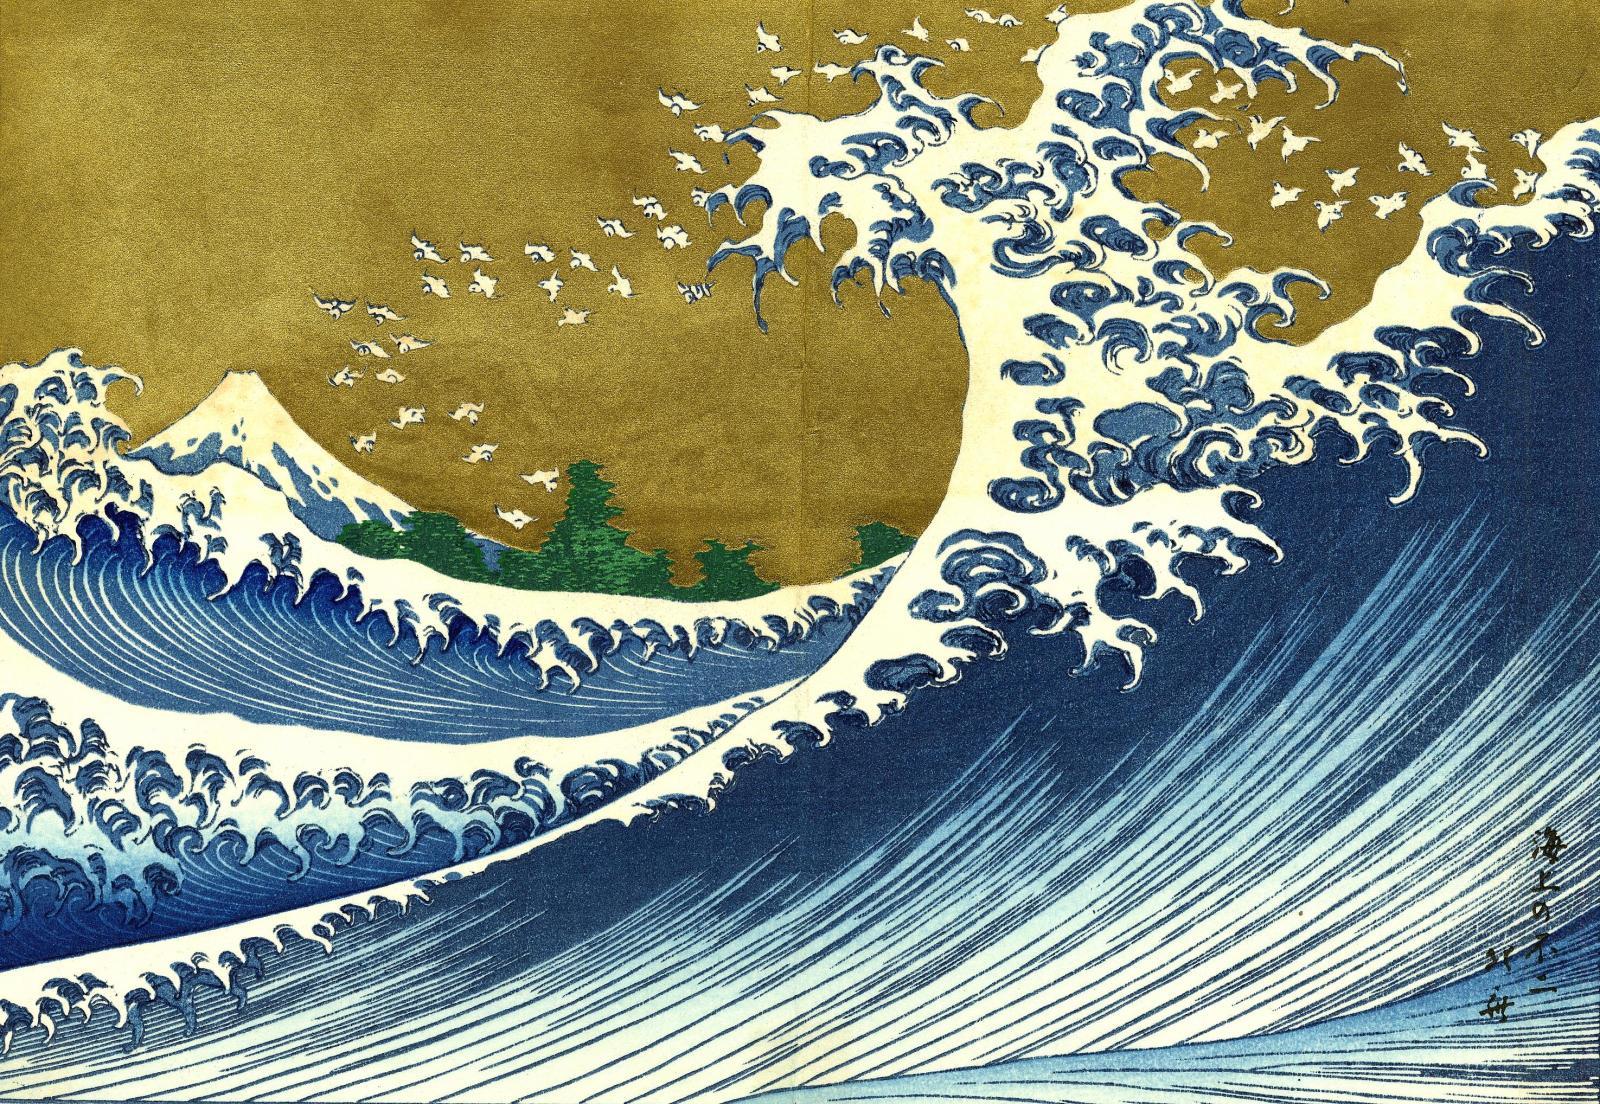 http://4.bp.blogspot.com/-iMyRZpmdiYw/Tpy0wNpbqWI/AAAAAAAAD-E/oKJwmhHKMhk/s1600/hokusai-wave-2.jpg